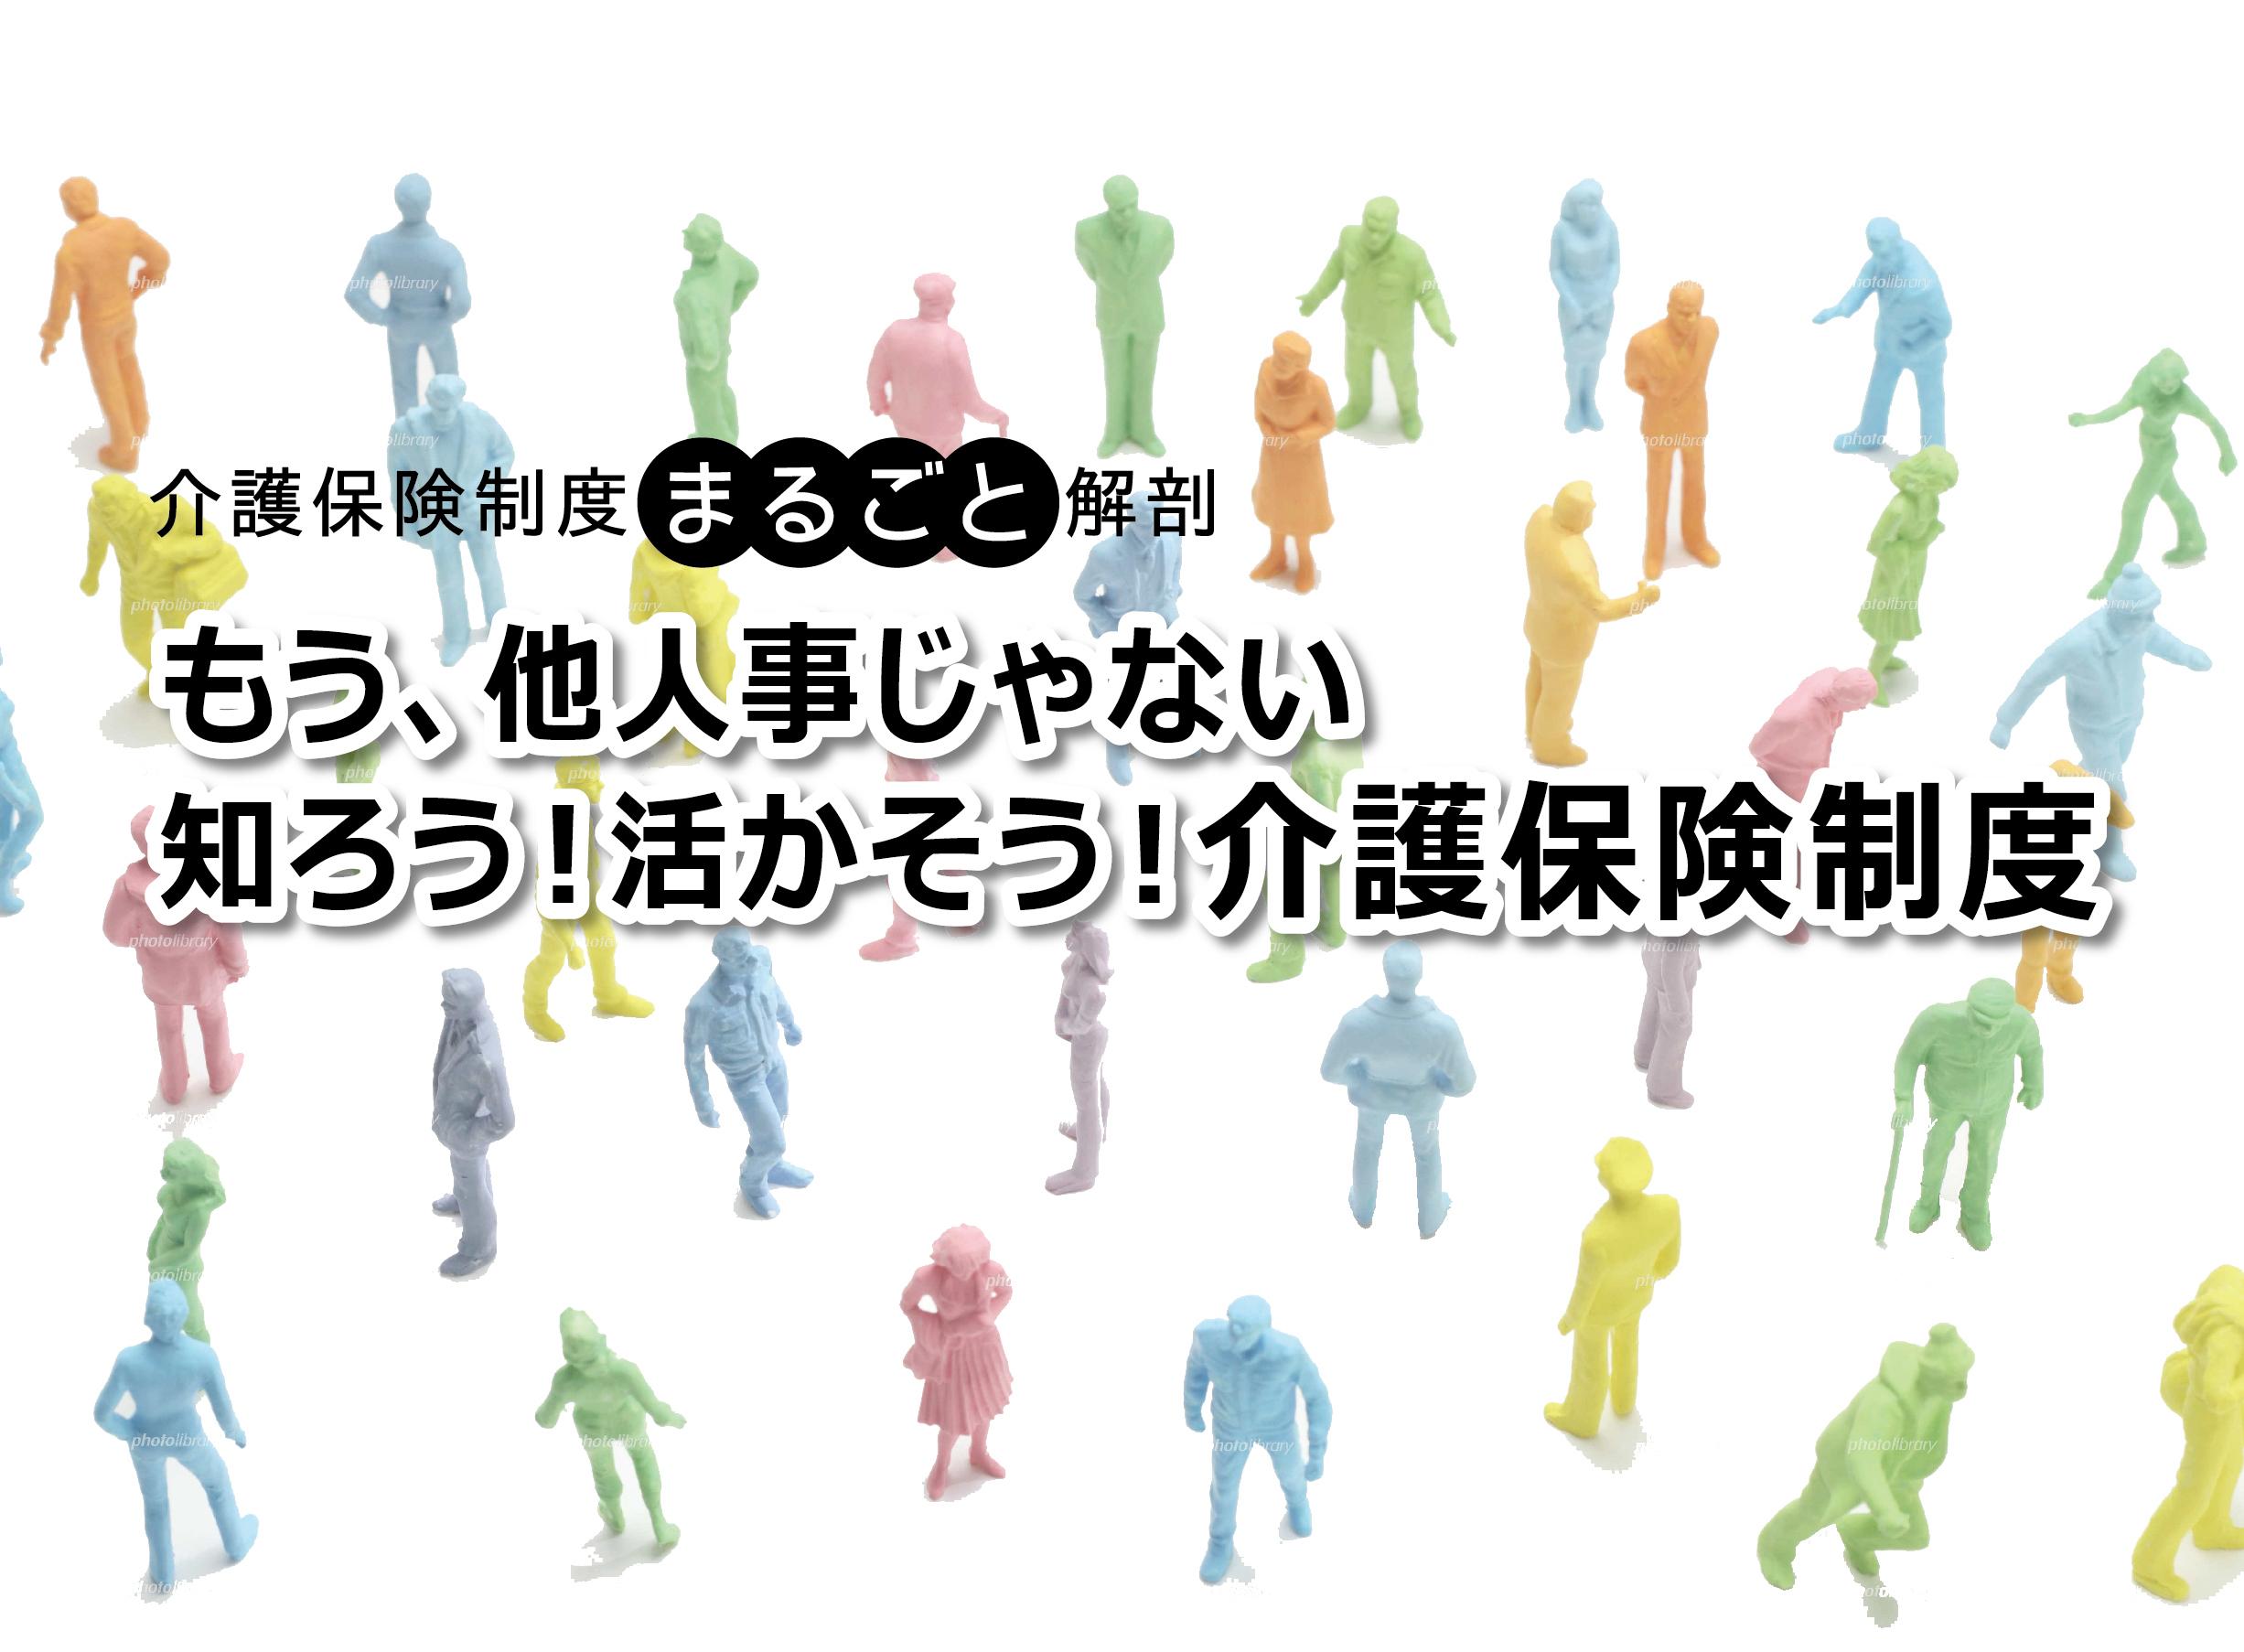 26介護保険講座チラシ綾瀬_1105